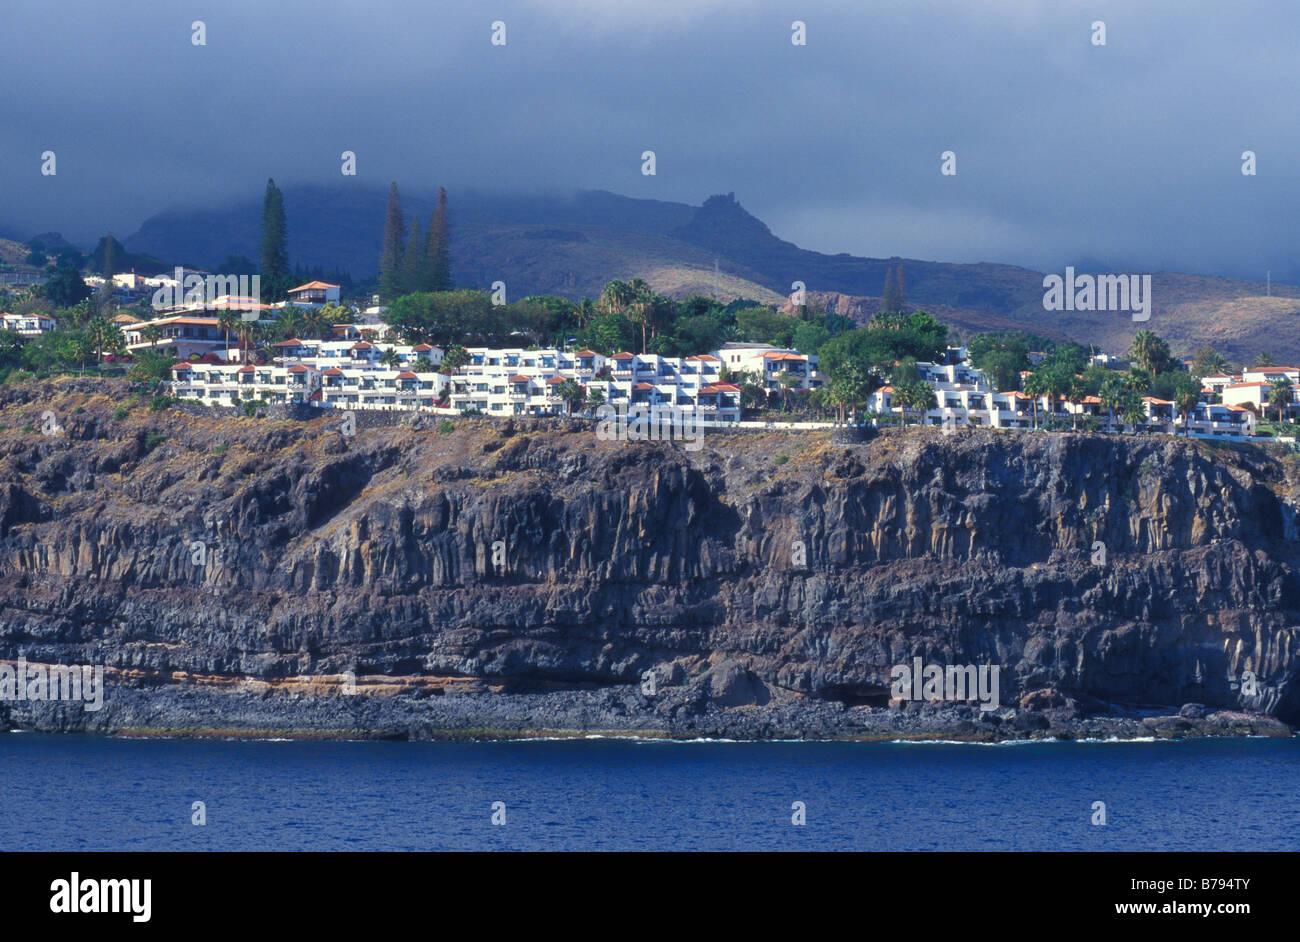 Hotel jardin tecina playa de santiago la gomera island for Jardin tecina gomera